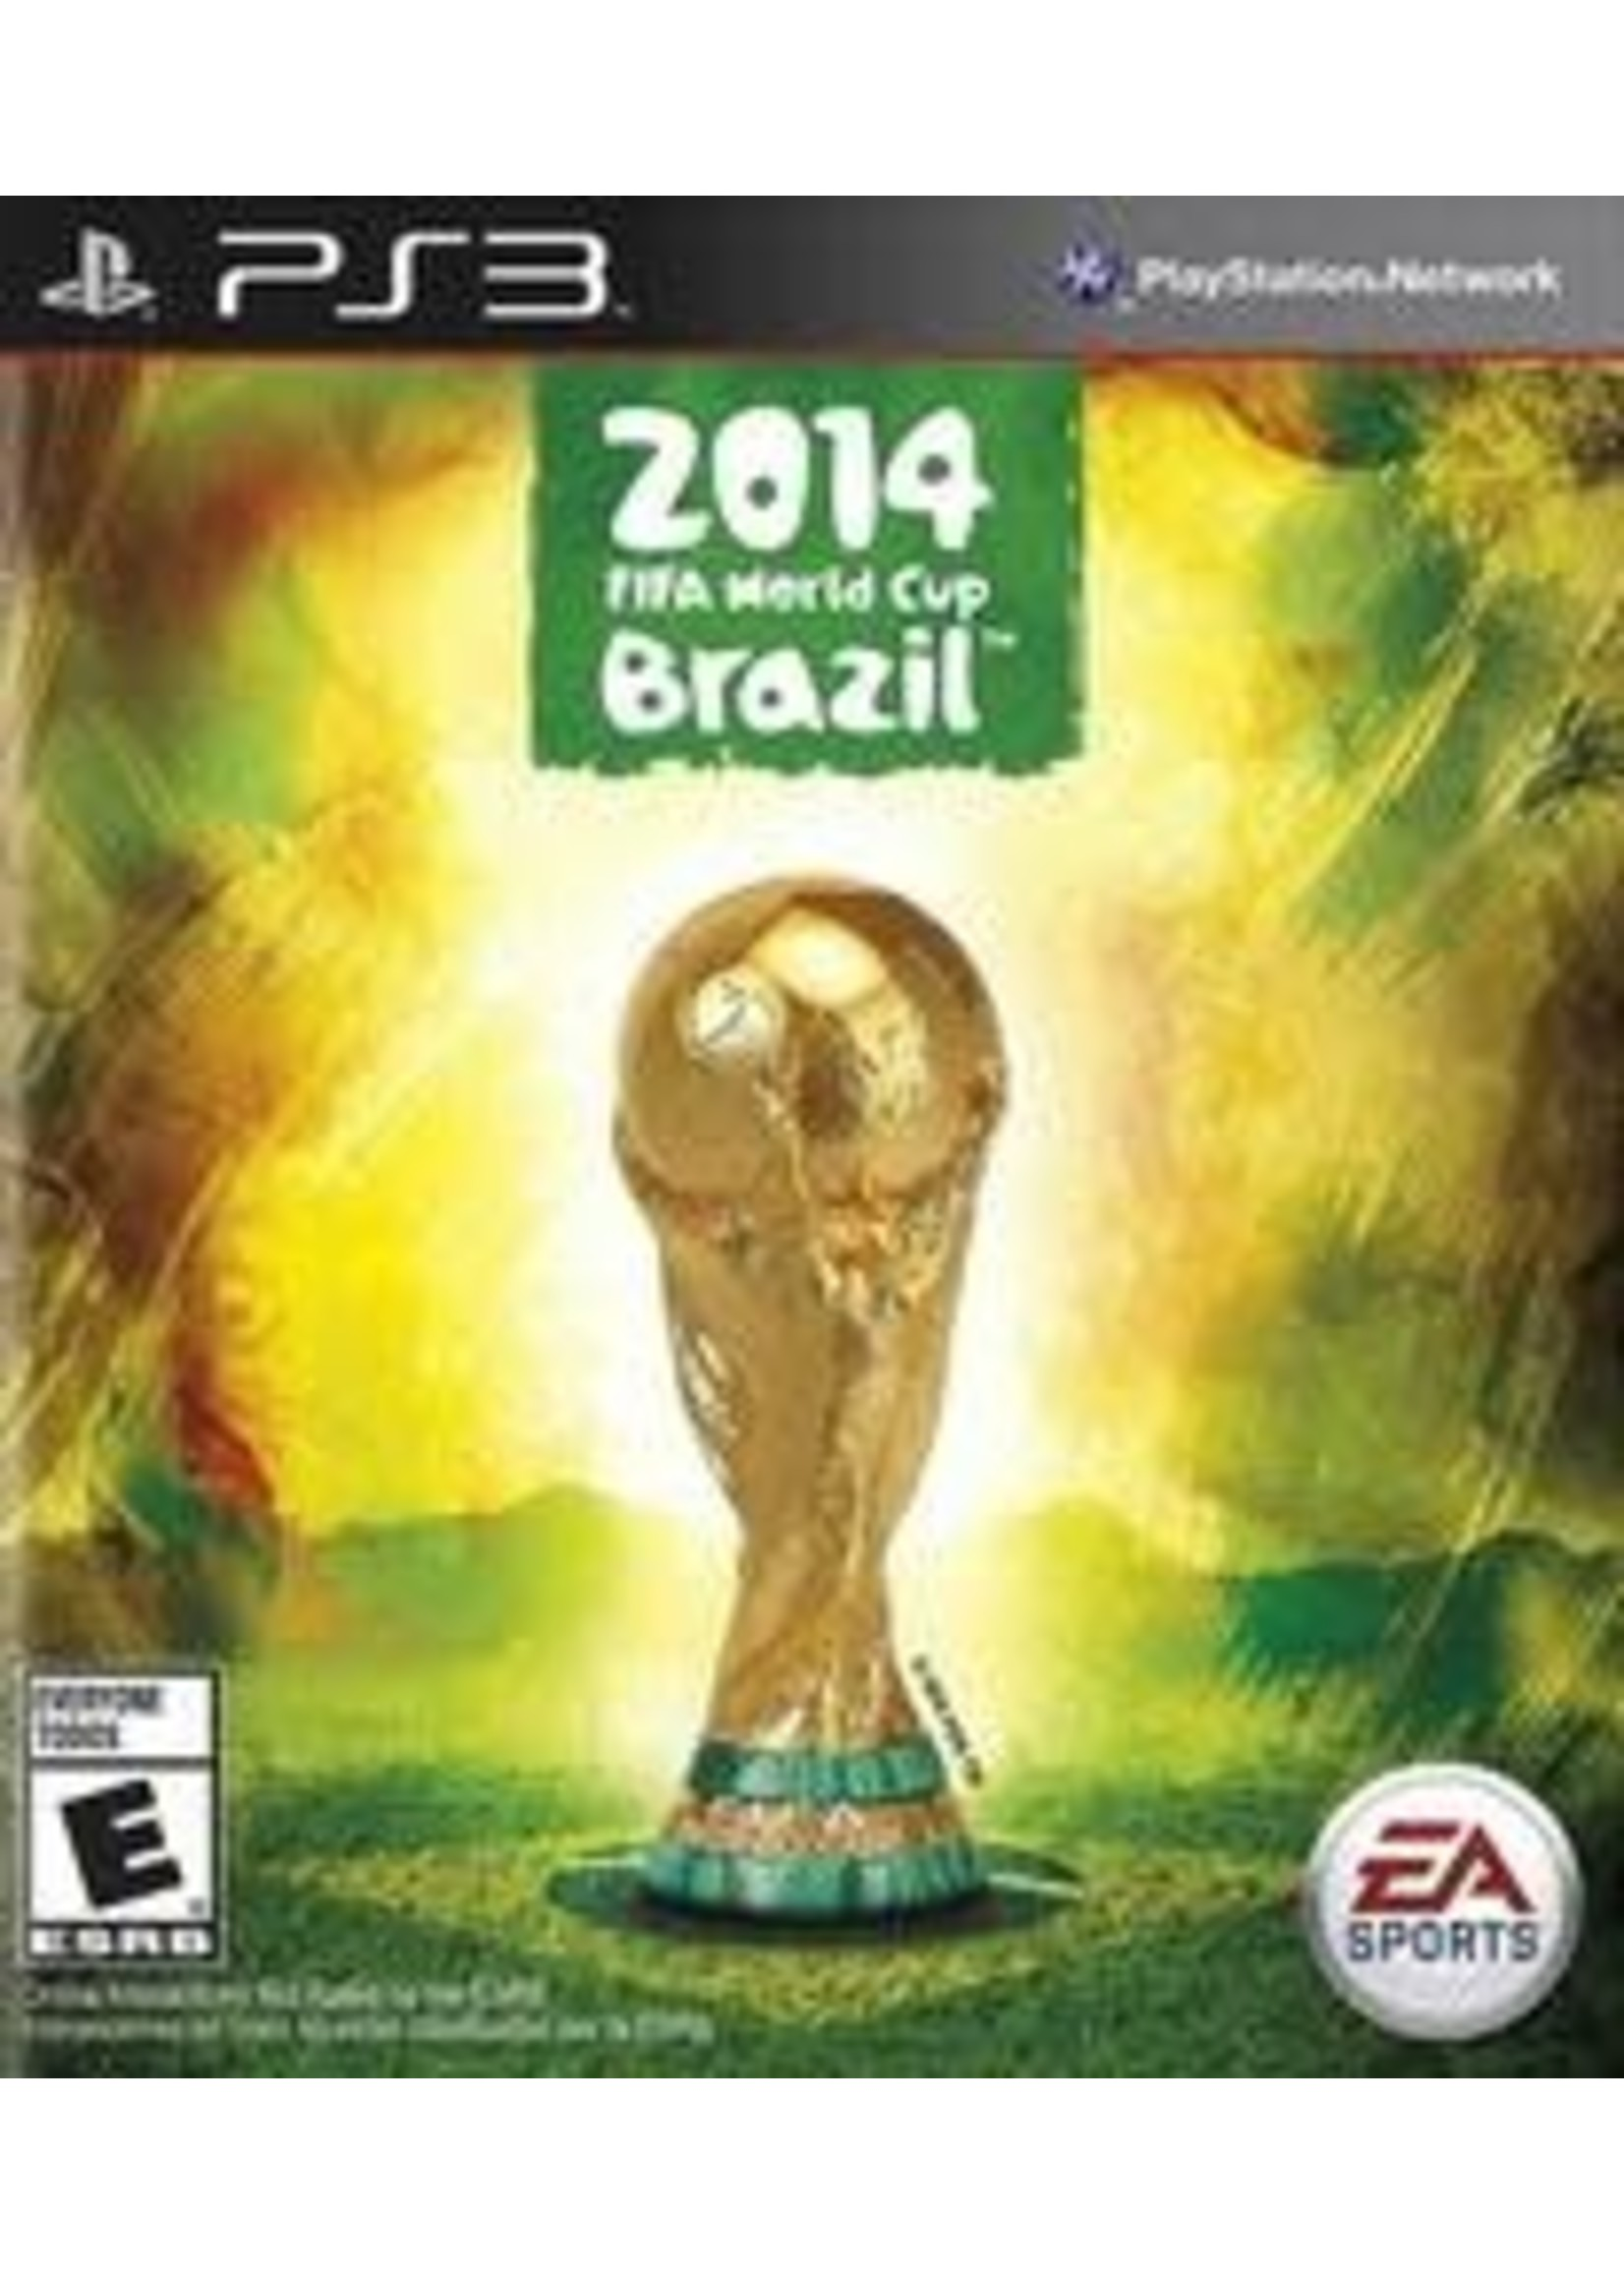 2014 FIFA World Cup Brazil Playstation 3